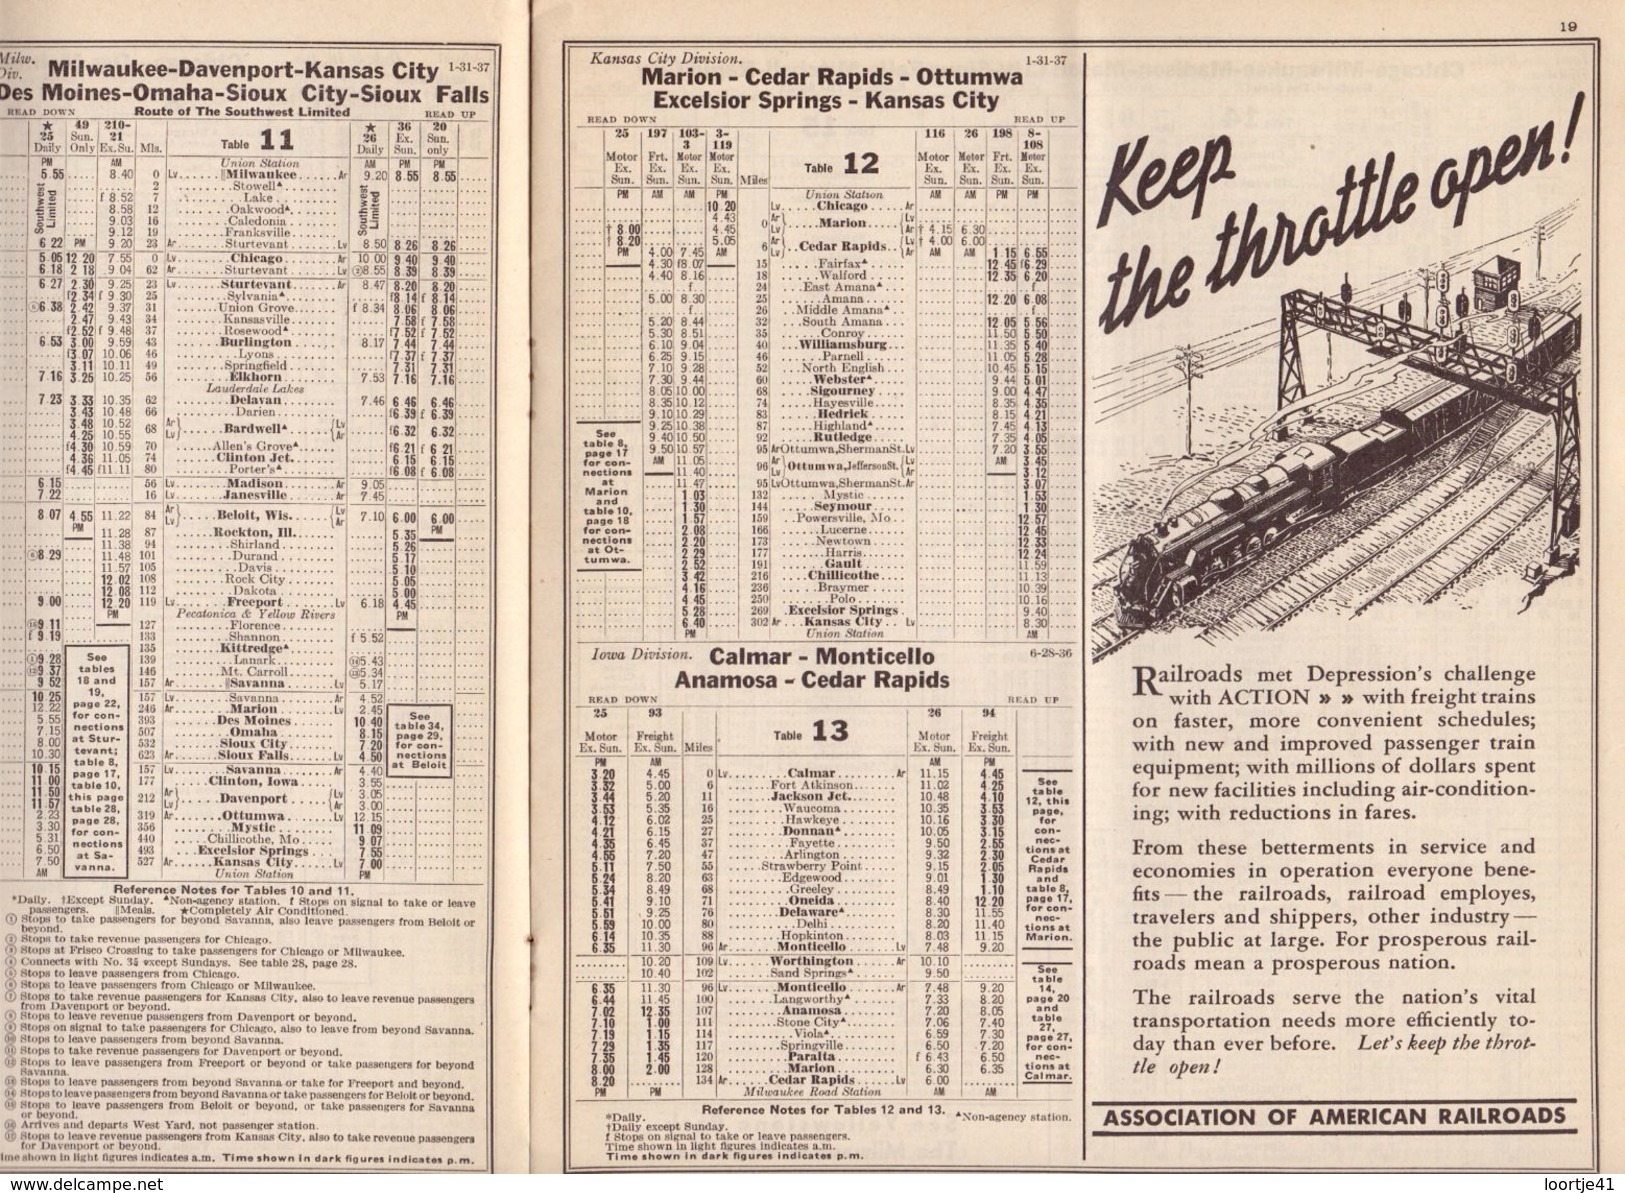 Tourisme - Timetables Schedules Dienstregeling  - Trains Treinen Milwaukee Road - The Hiawatha Time Tables 1937 - World